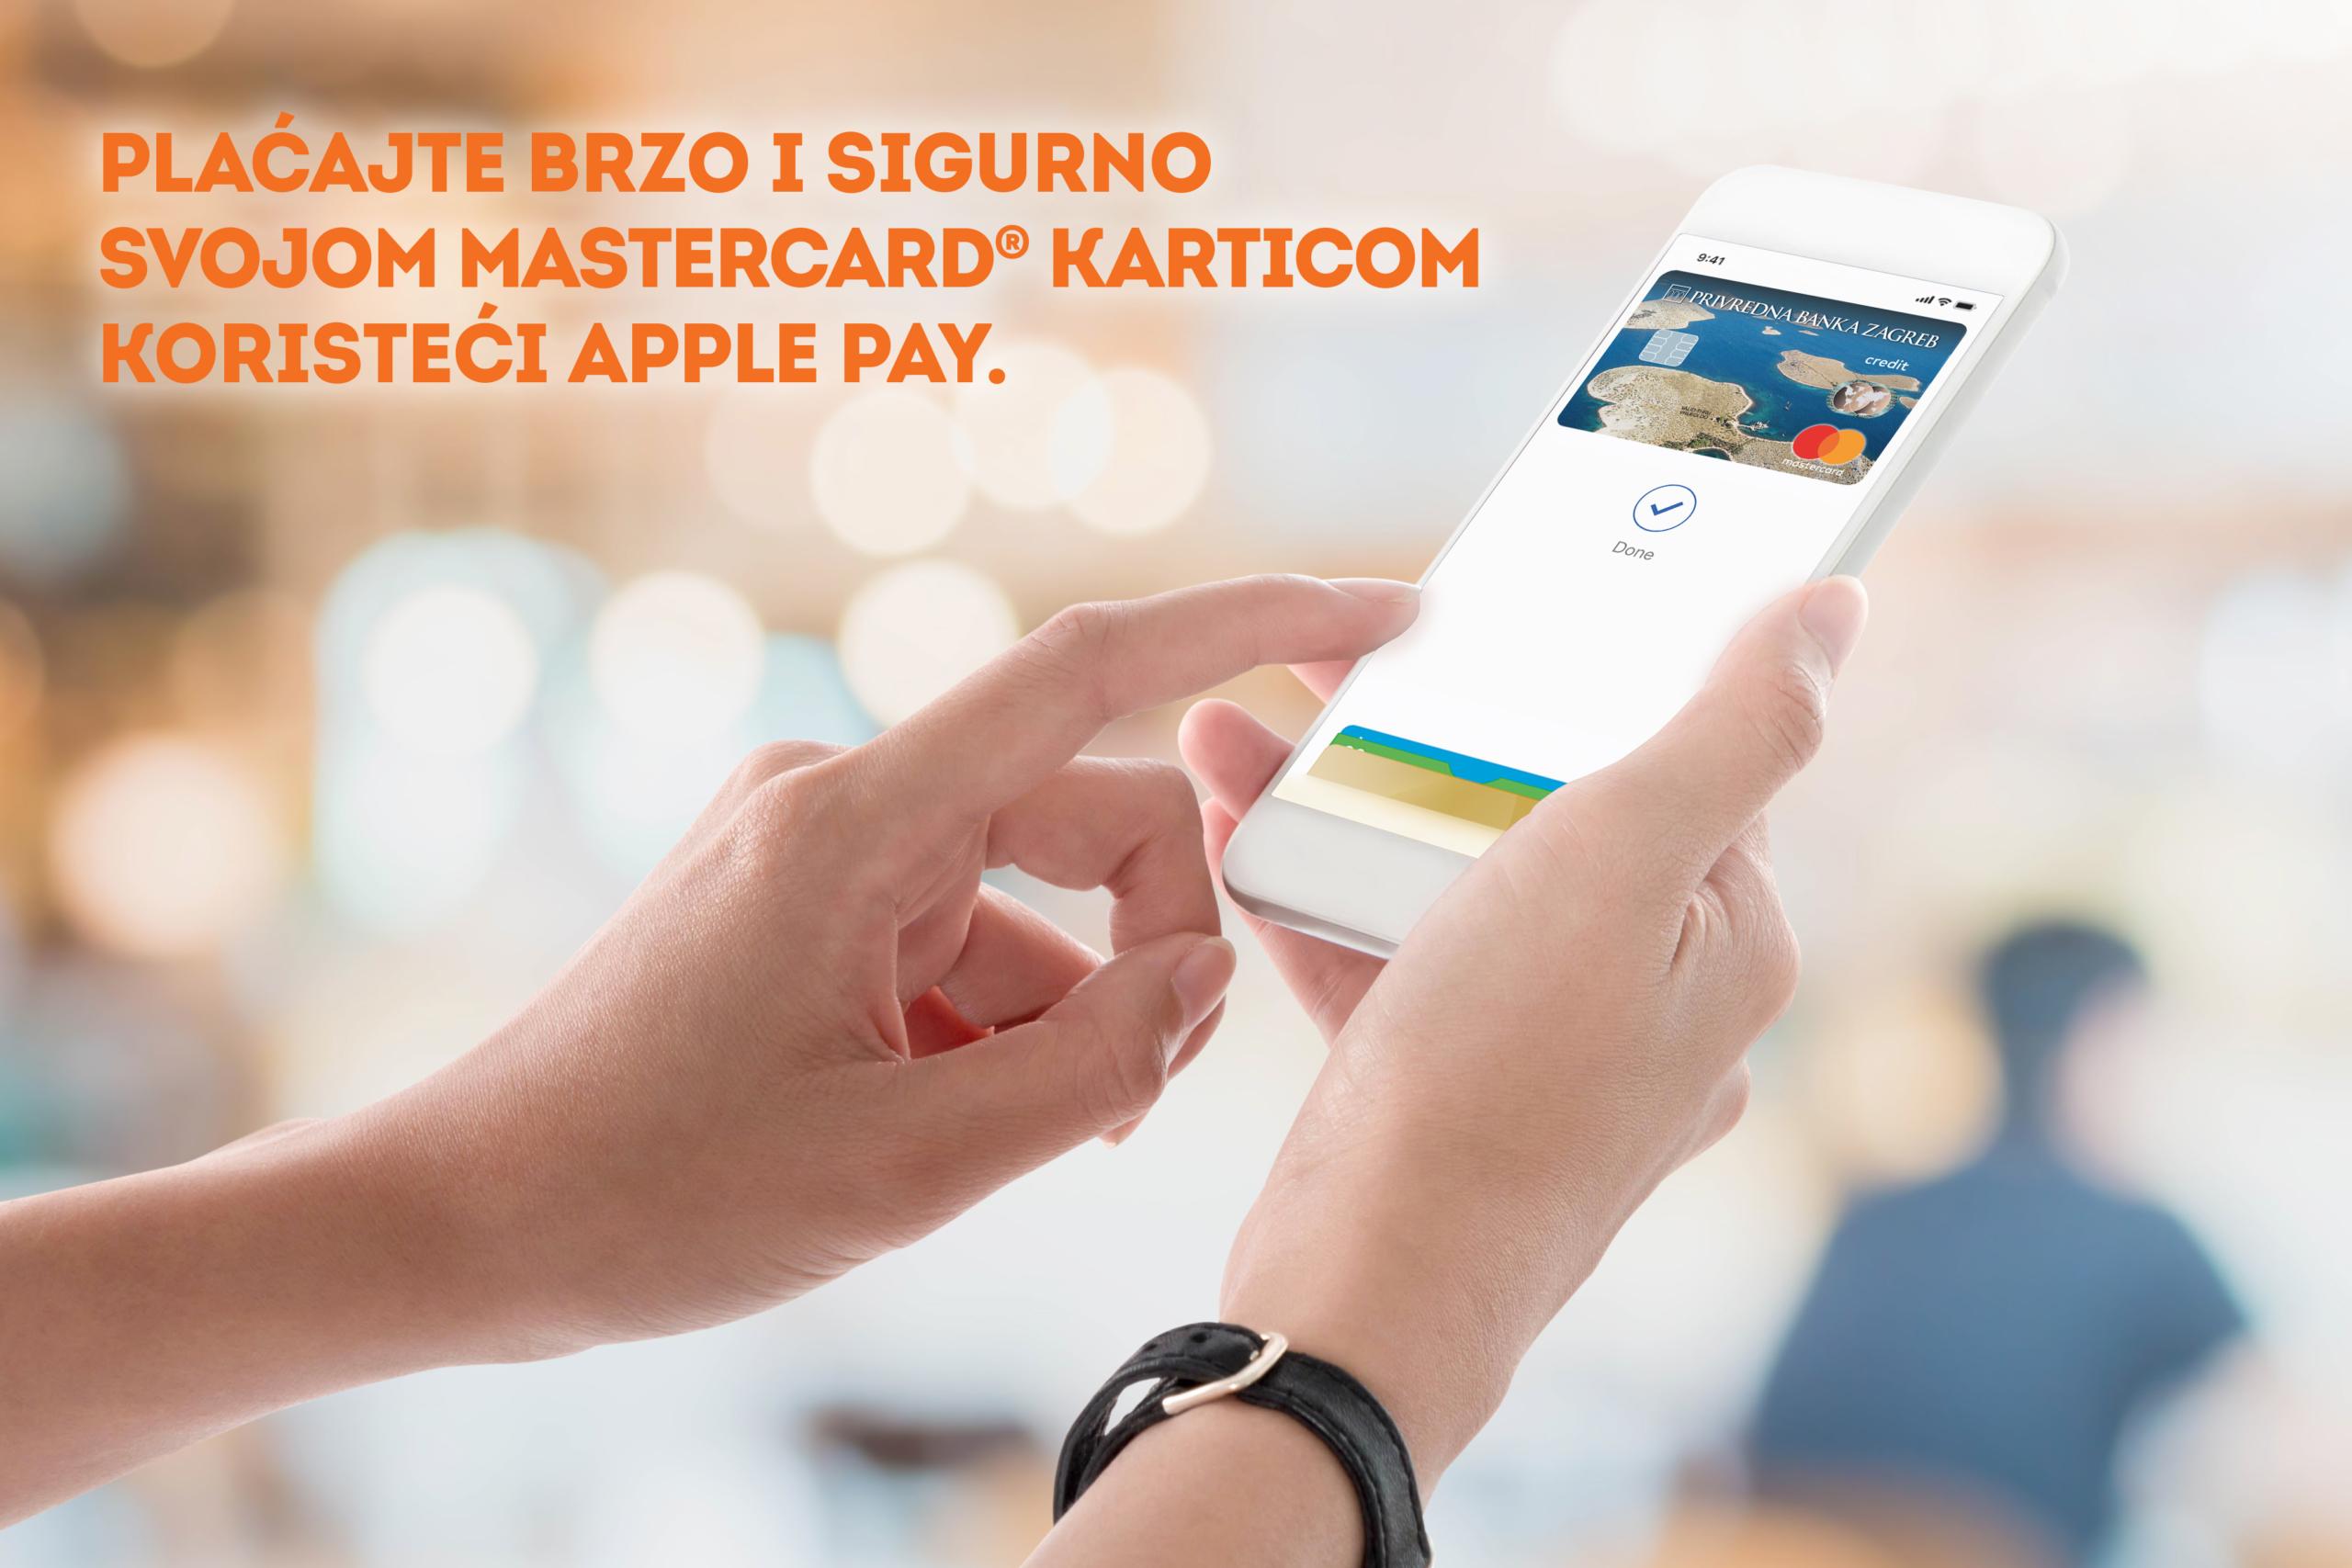 Apple Pay PBZ